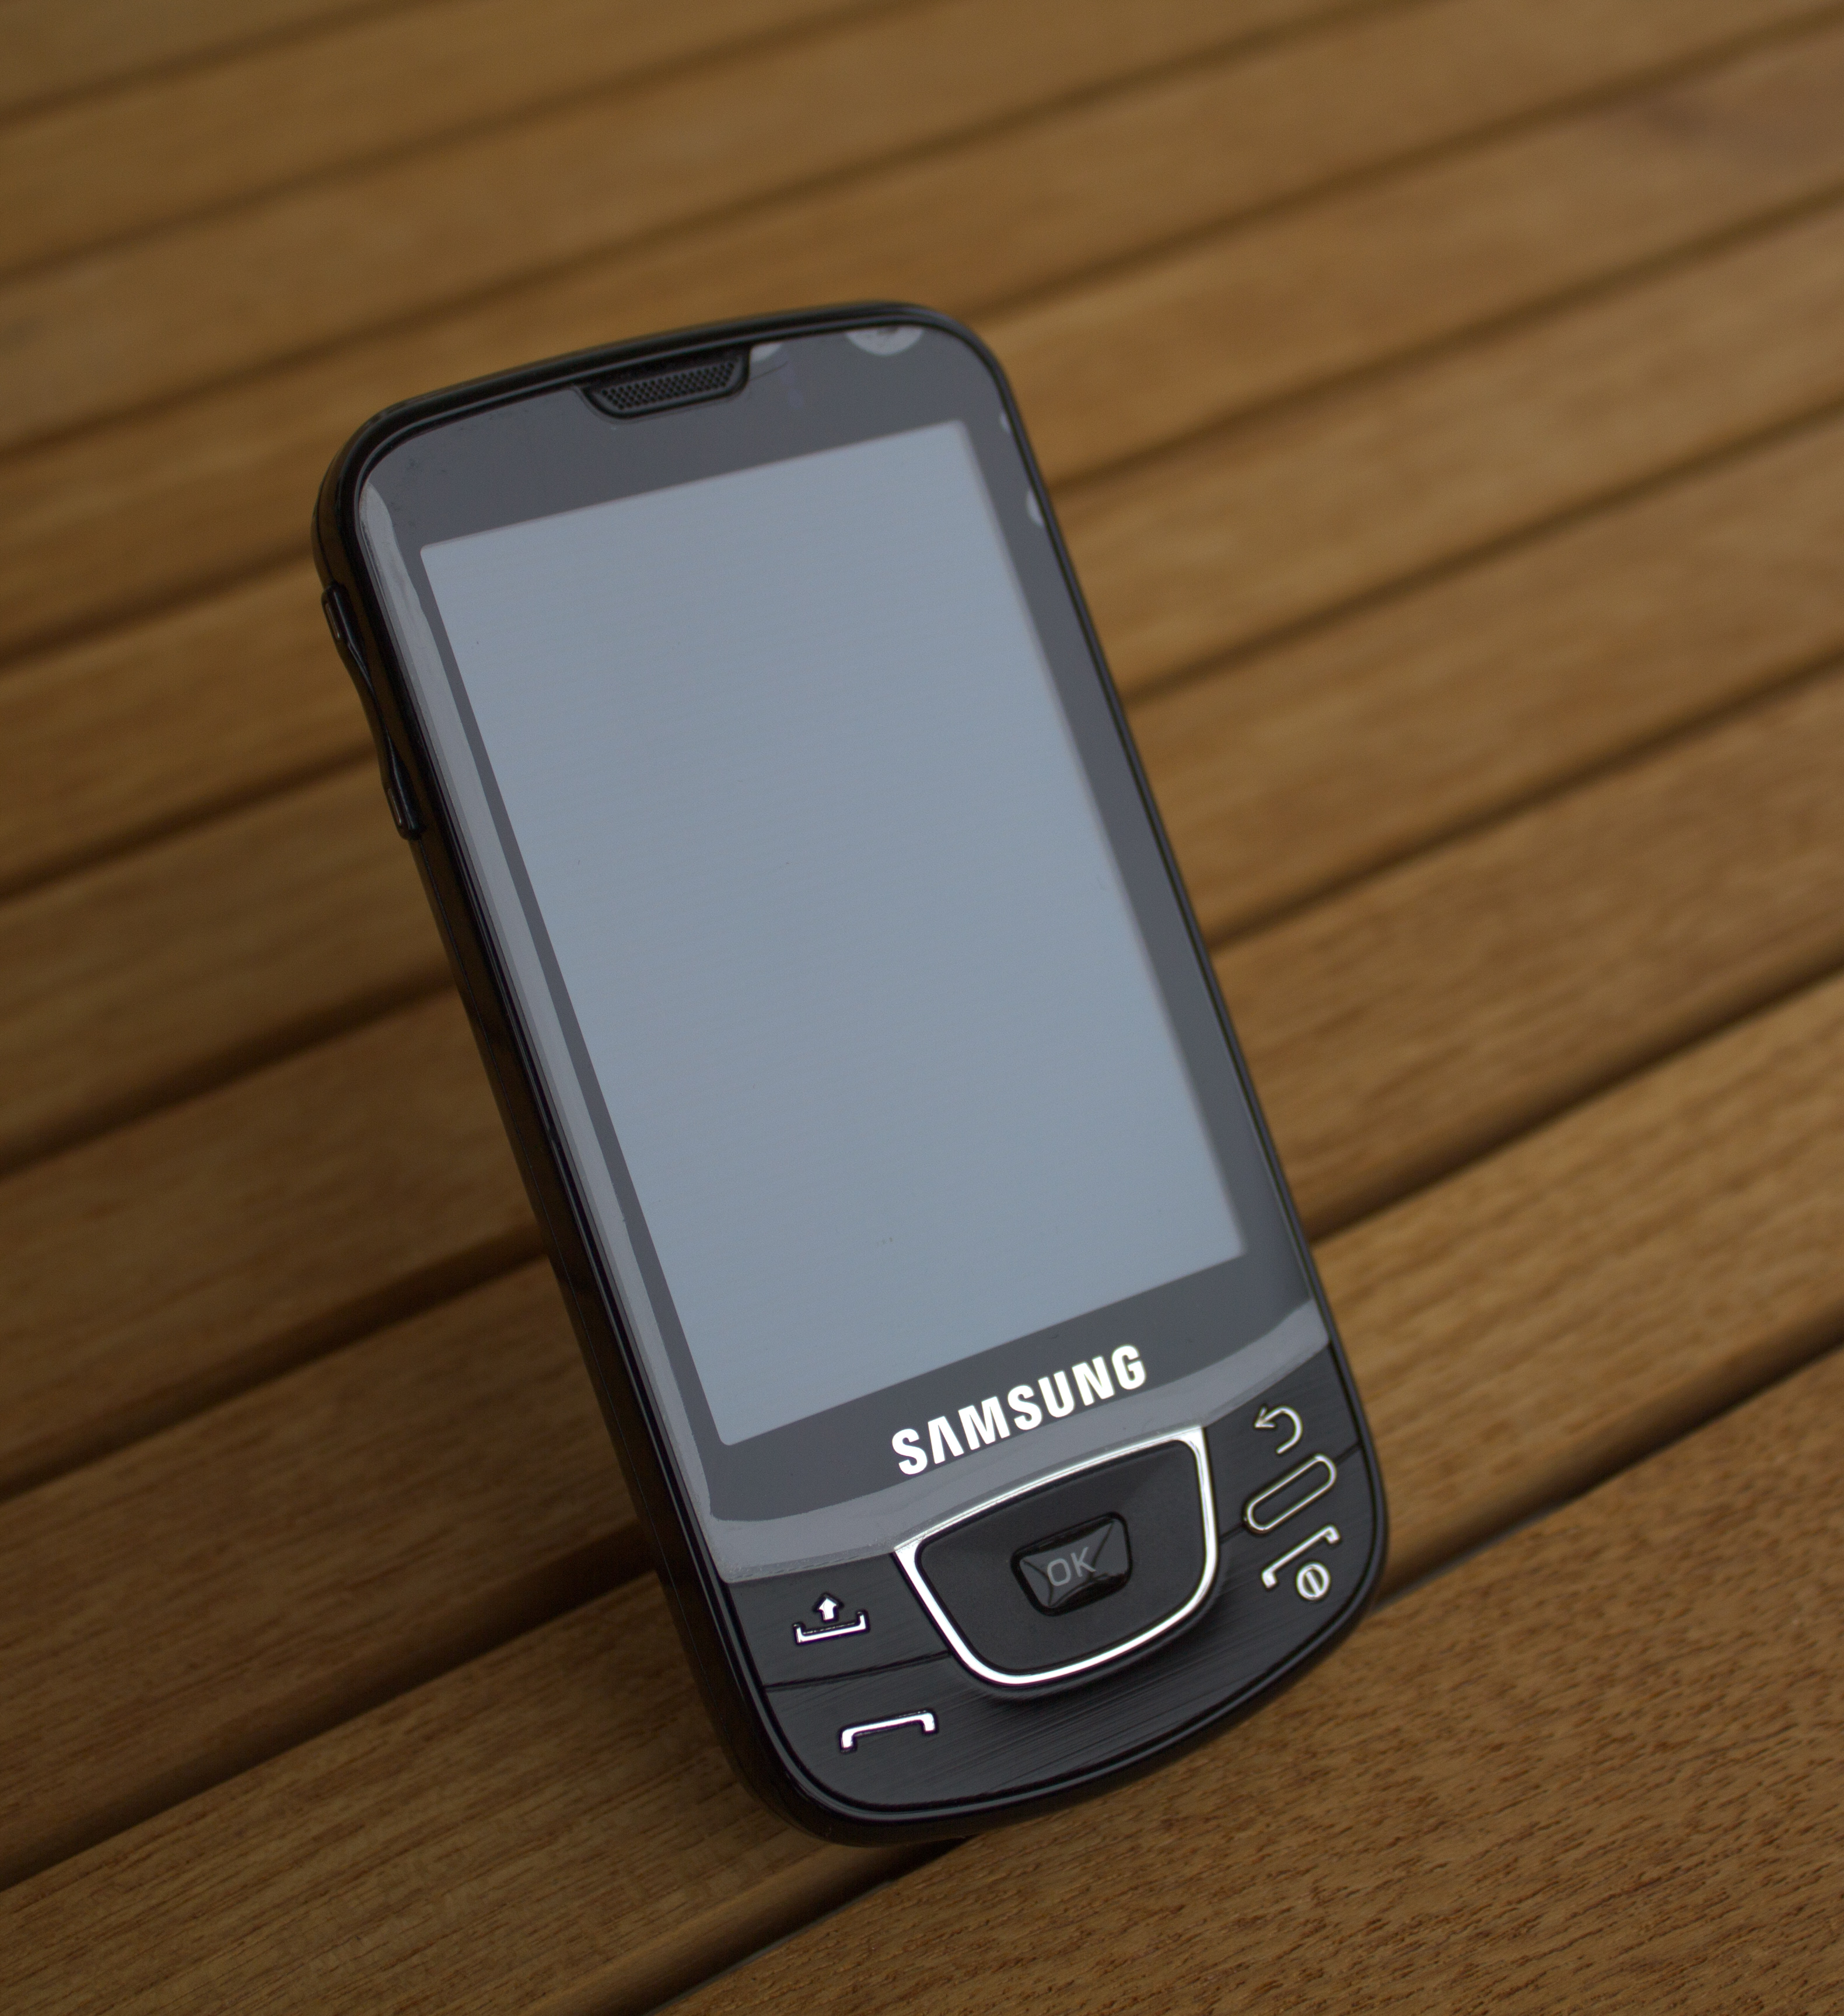 Samsung Galaxy (original) - Wikipedia